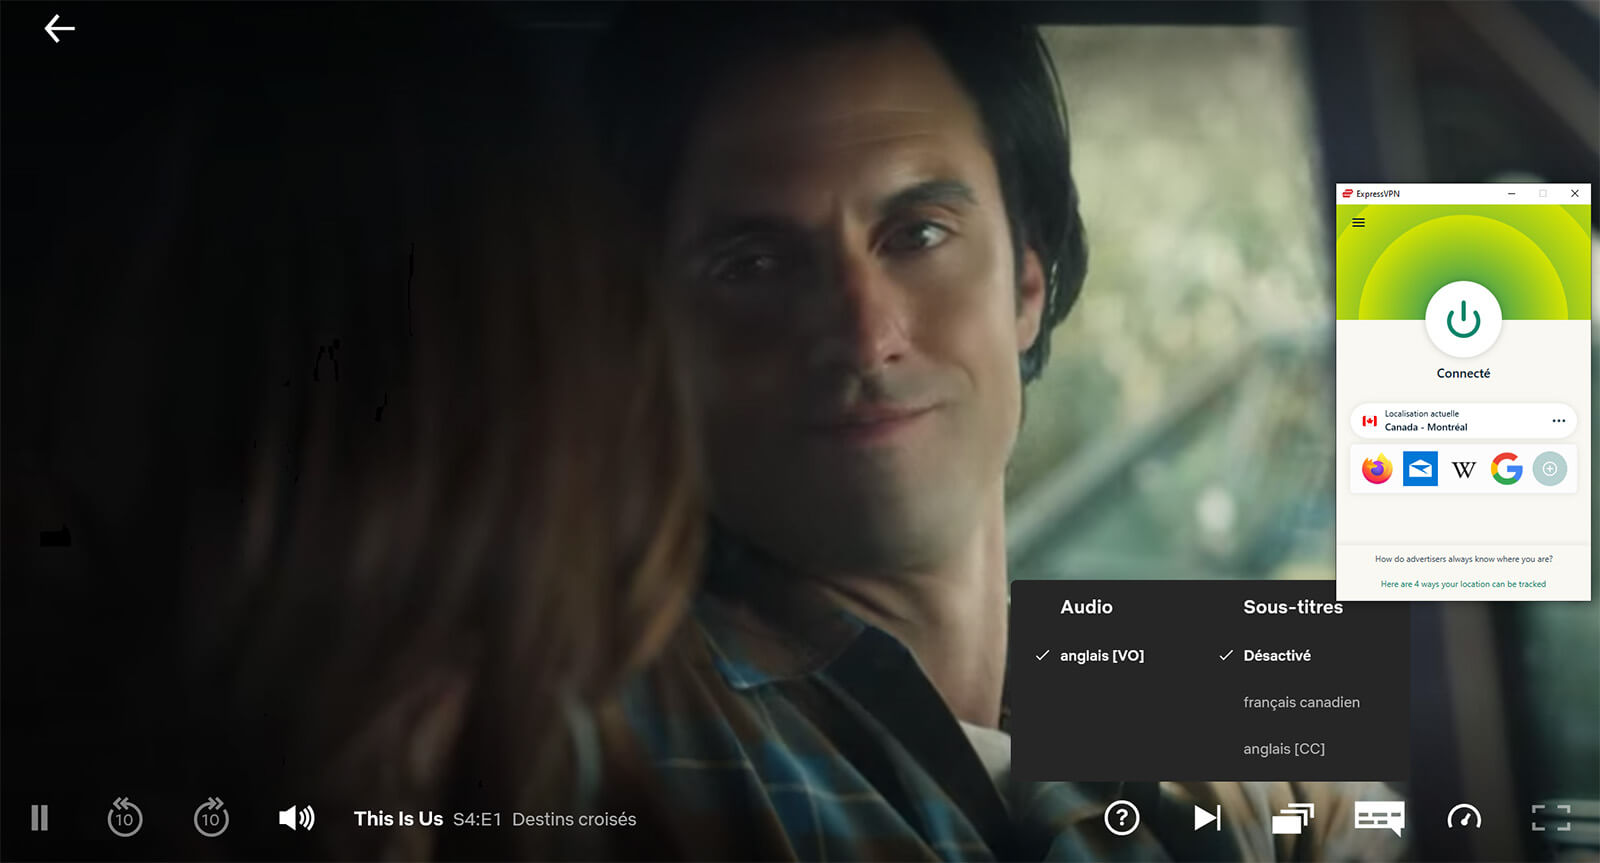 Visionnage This Is Us saison 4 Netflix ExpressVPN